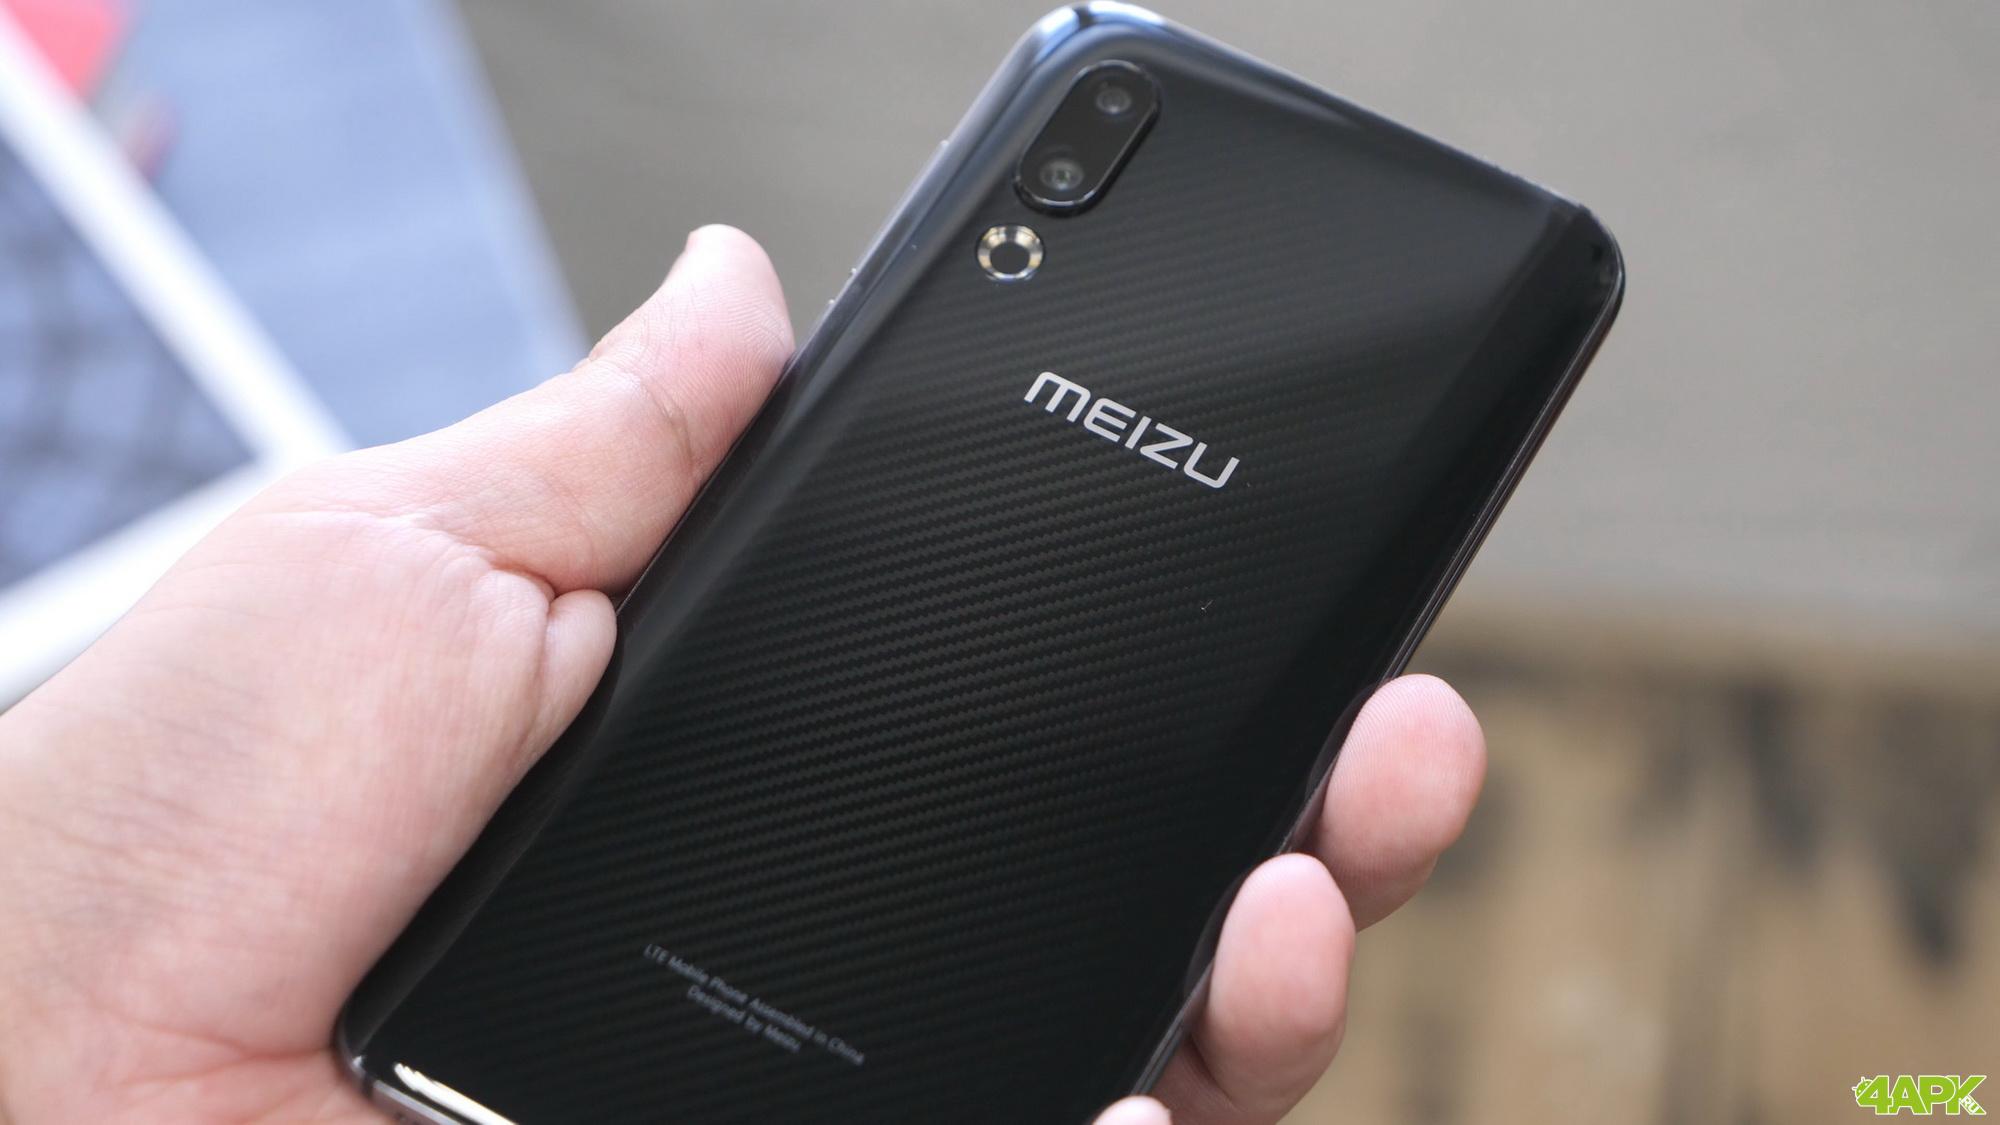 Обзор Meizu 16s: операционка Flyme OS с NFC Meizu  - obzor_meizu_16s_s_nfc_i_flyme_os_picture38_0